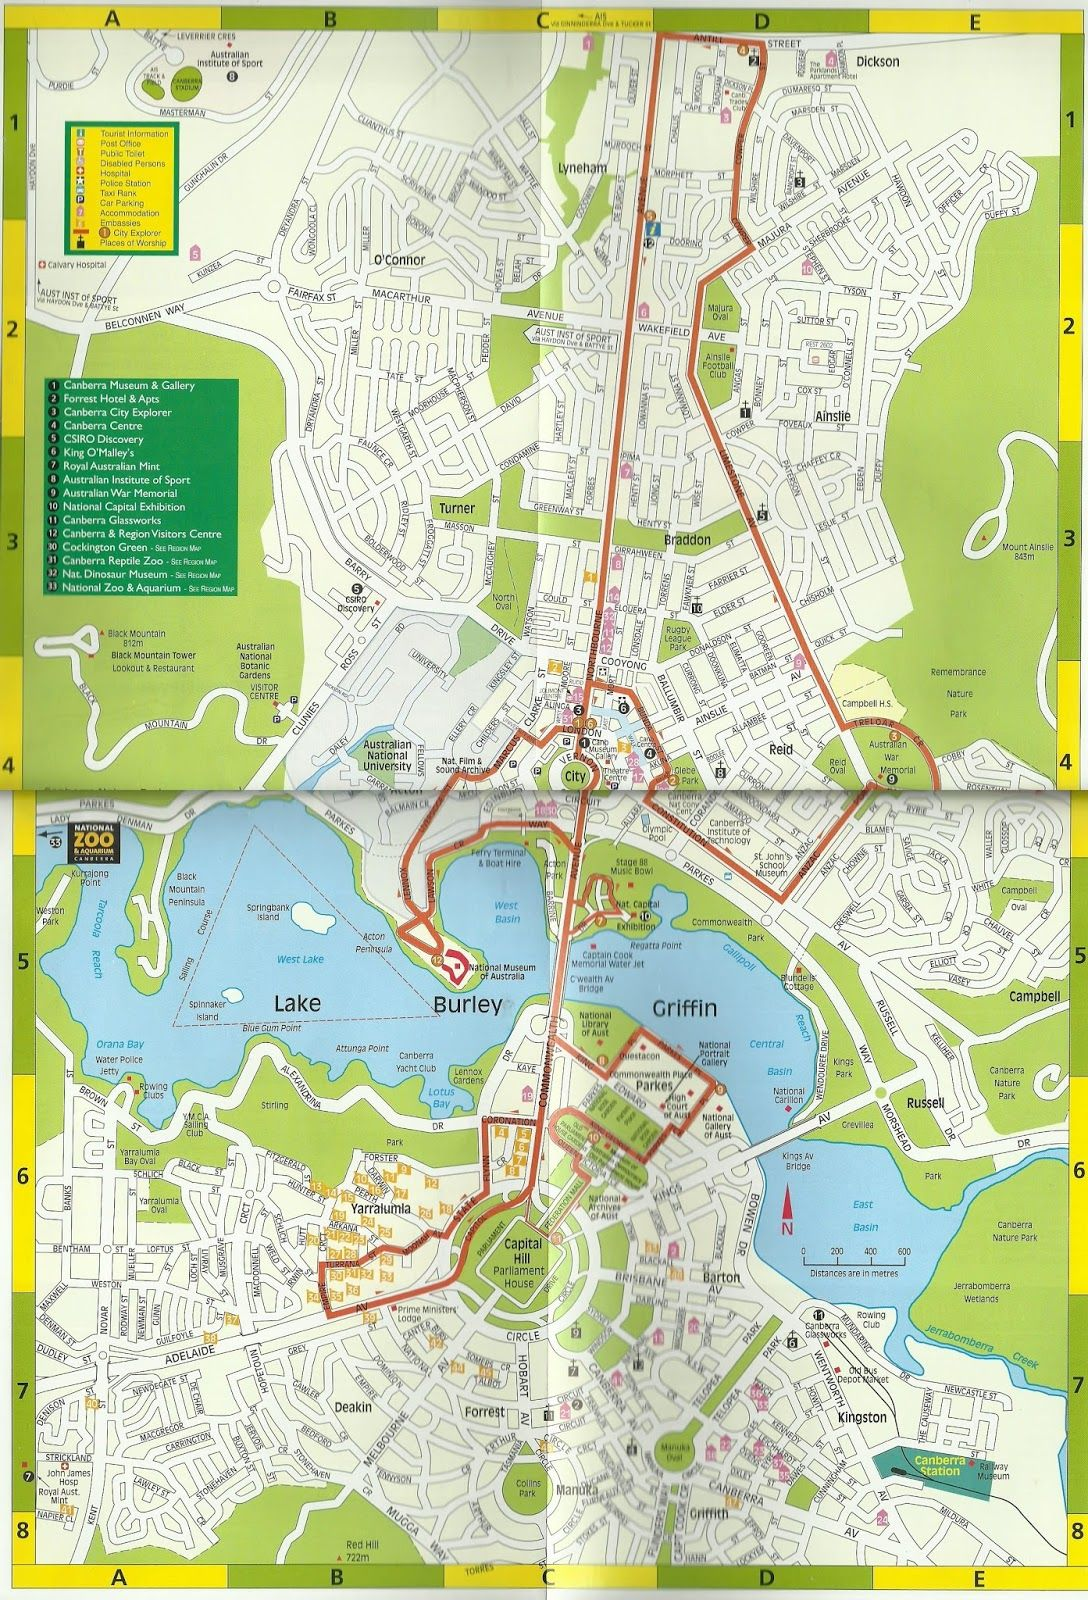 Mapa turstico de canberra australia australia pinterest mapa turstico de canberra australia tourist mapnew southsouth walesperth brisbanemelbourneworld gumiabroncs Images